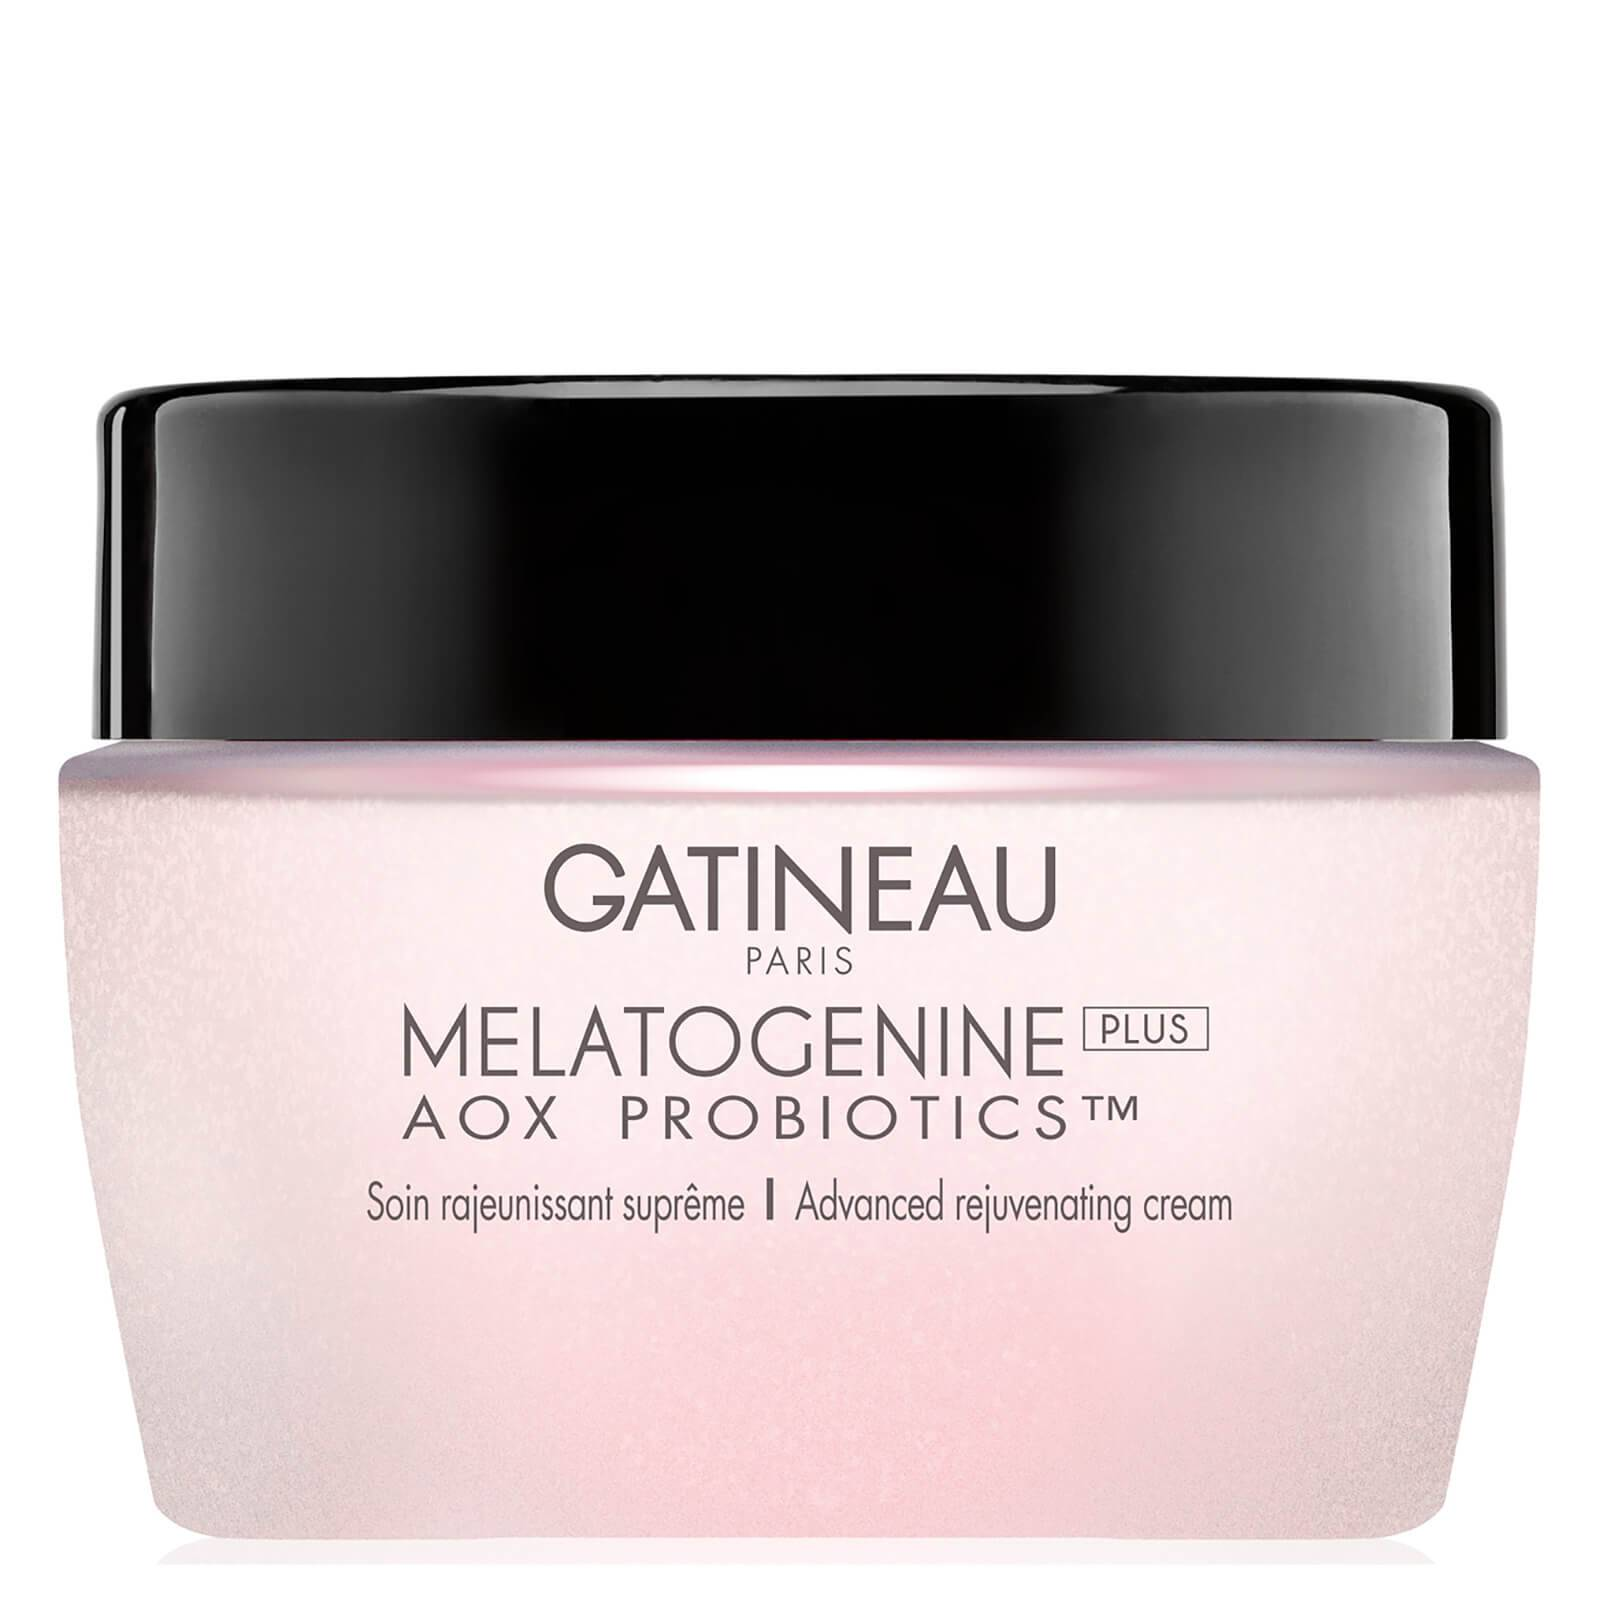 Gatineau Melatogenine Aox Probiotics Advanced Rejuvenating Cream (50ml)